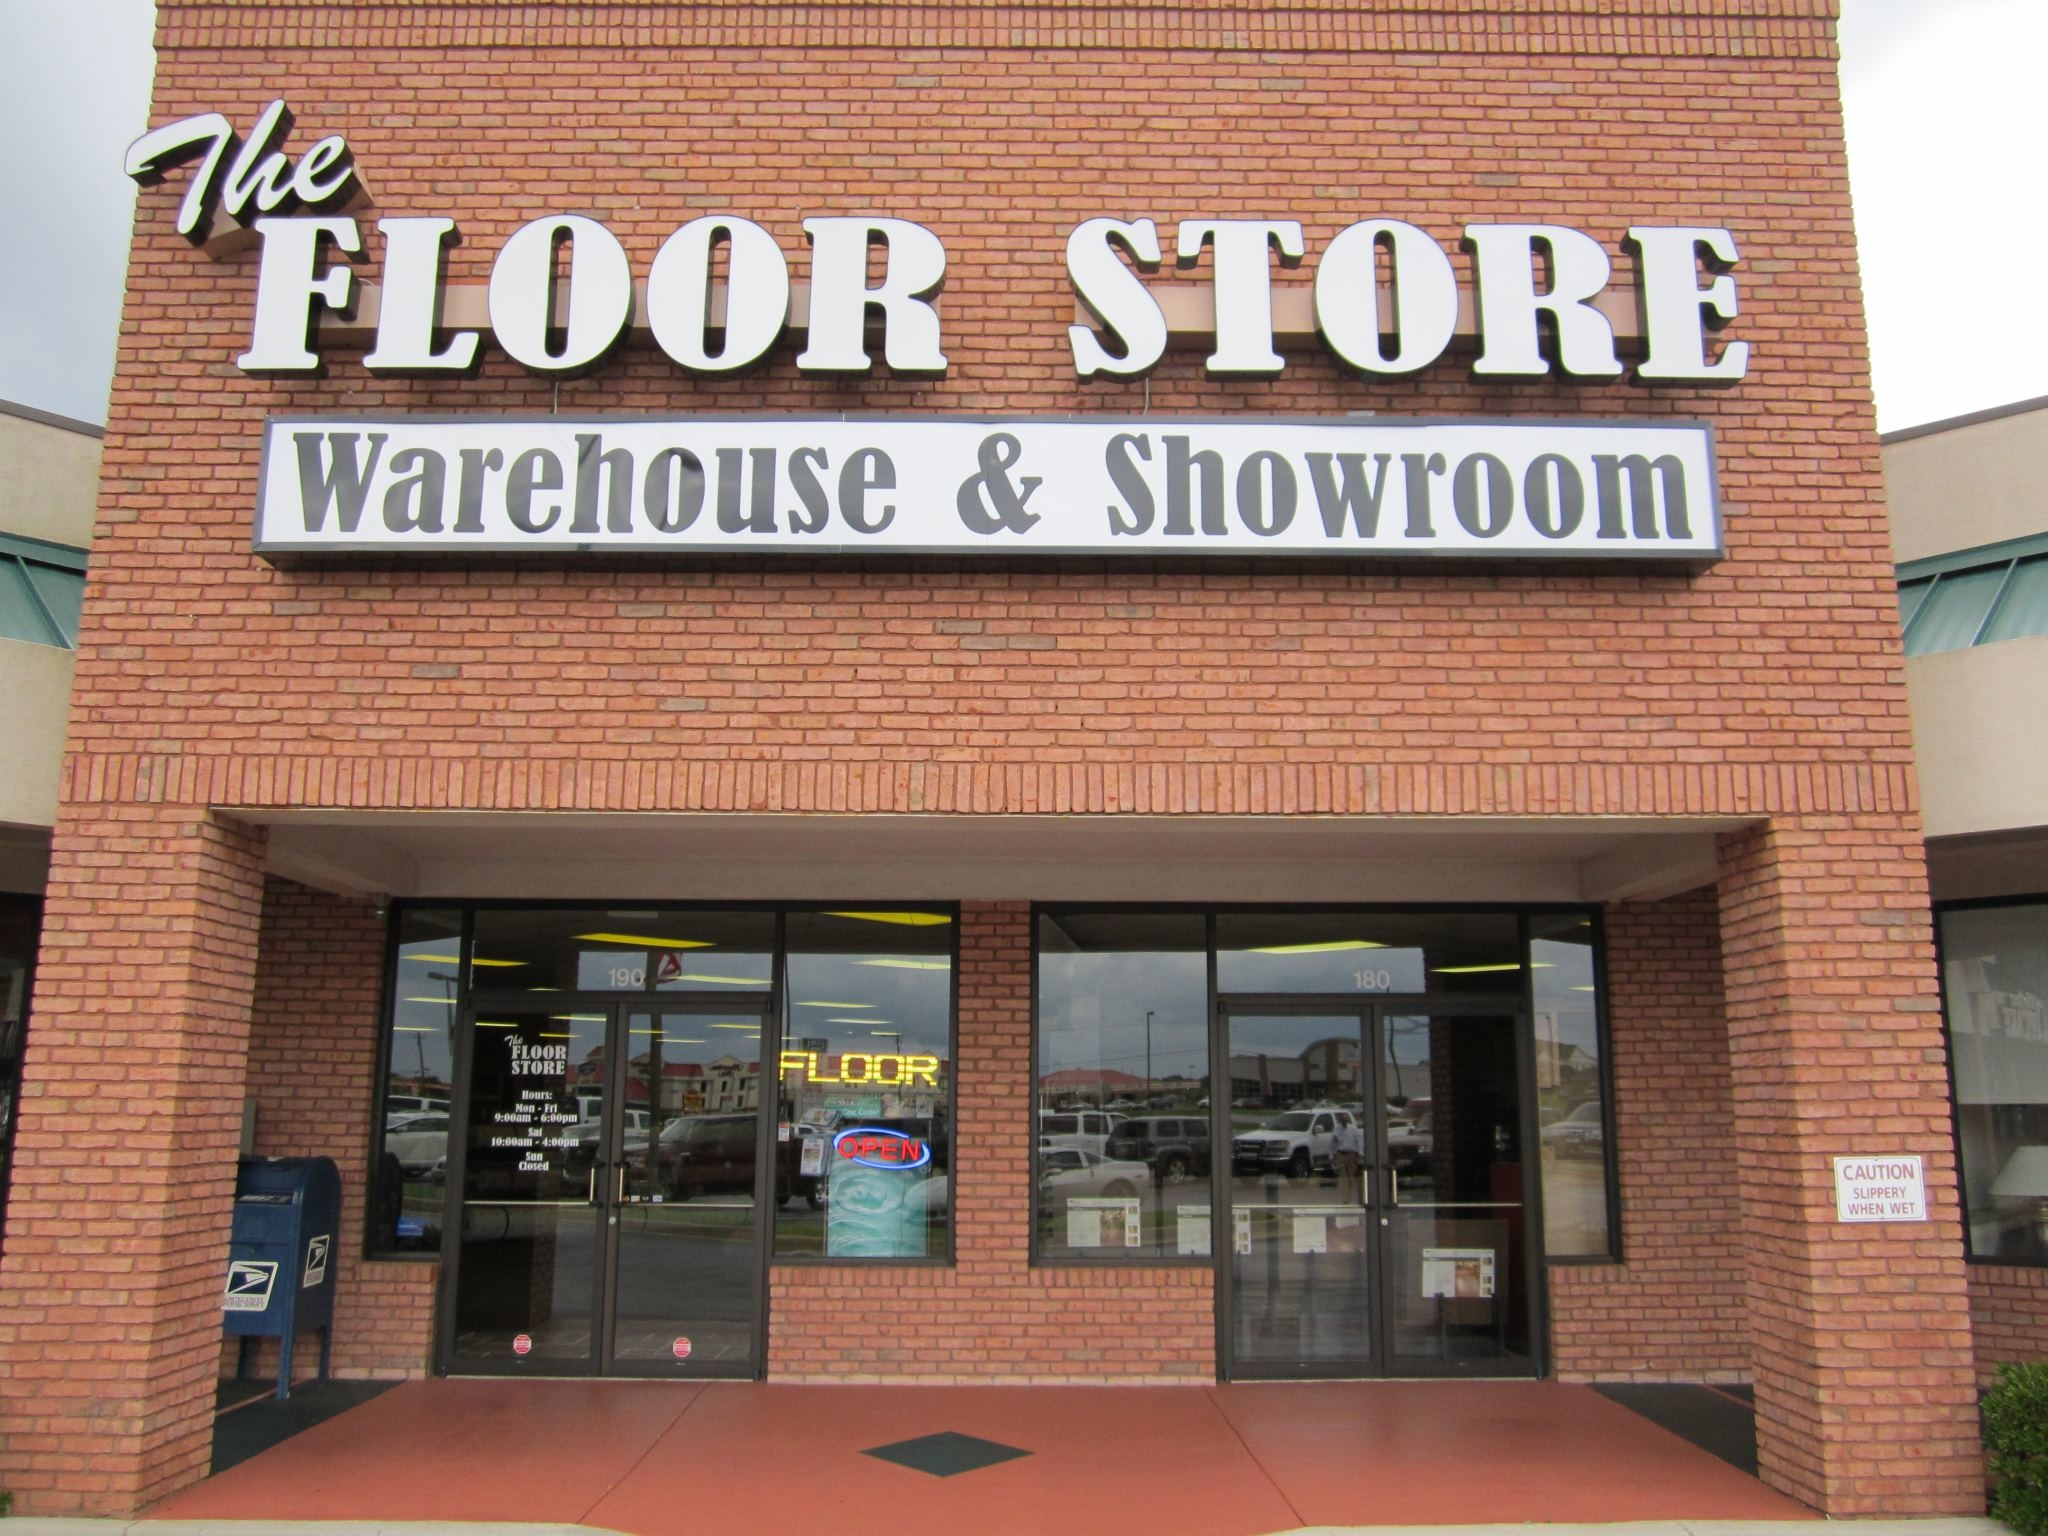 Good Furniture Store In Warner Robins Ga | Modern Outdoor Furniture Brands